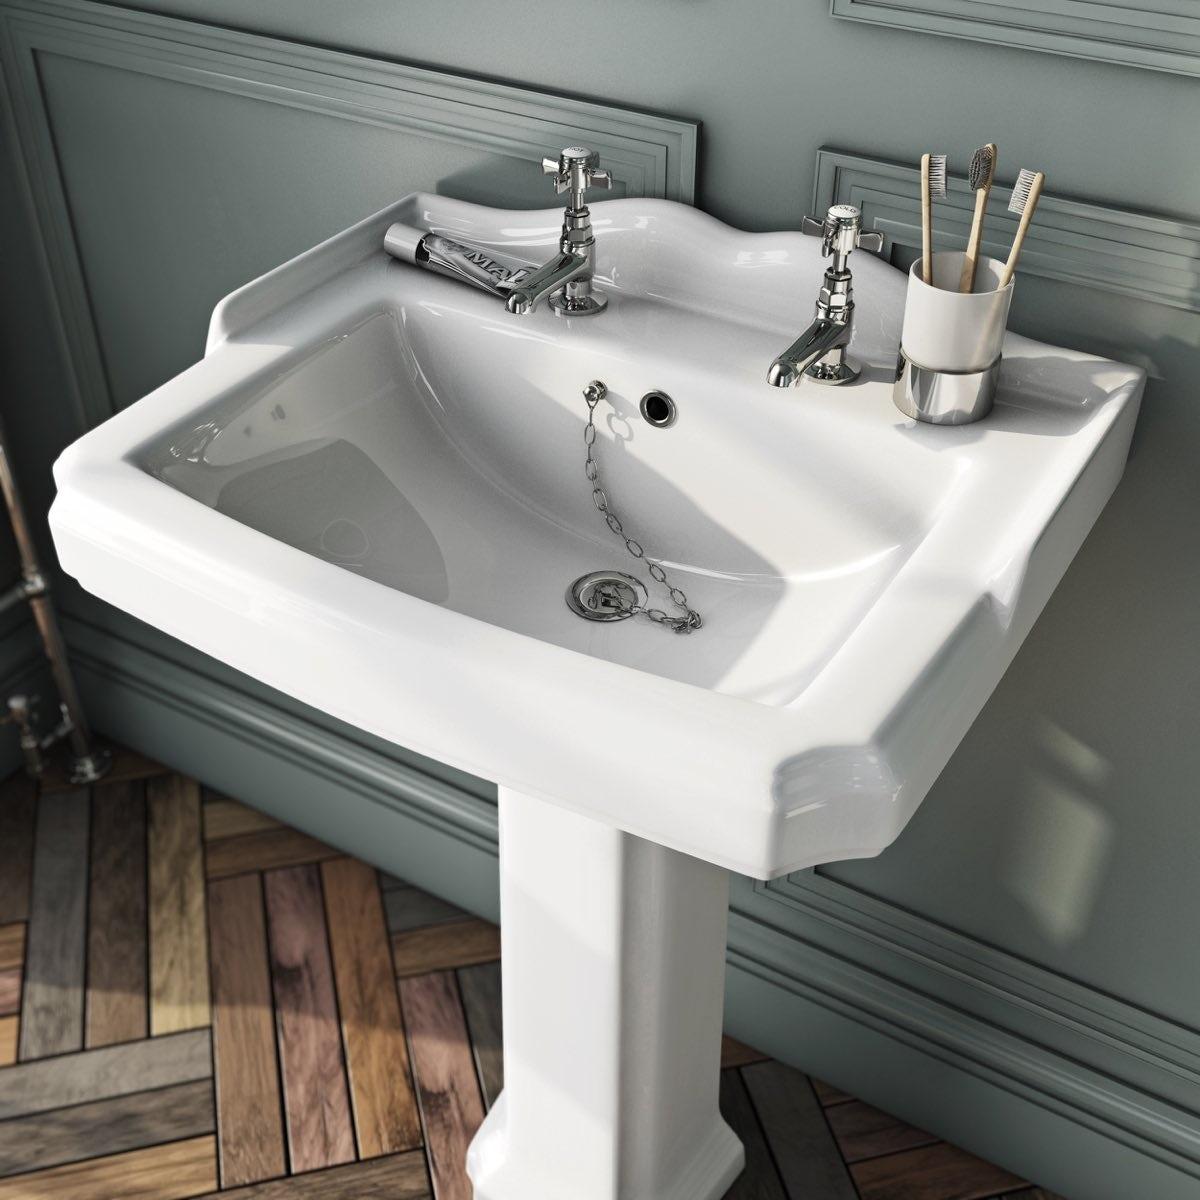 Traditional basins